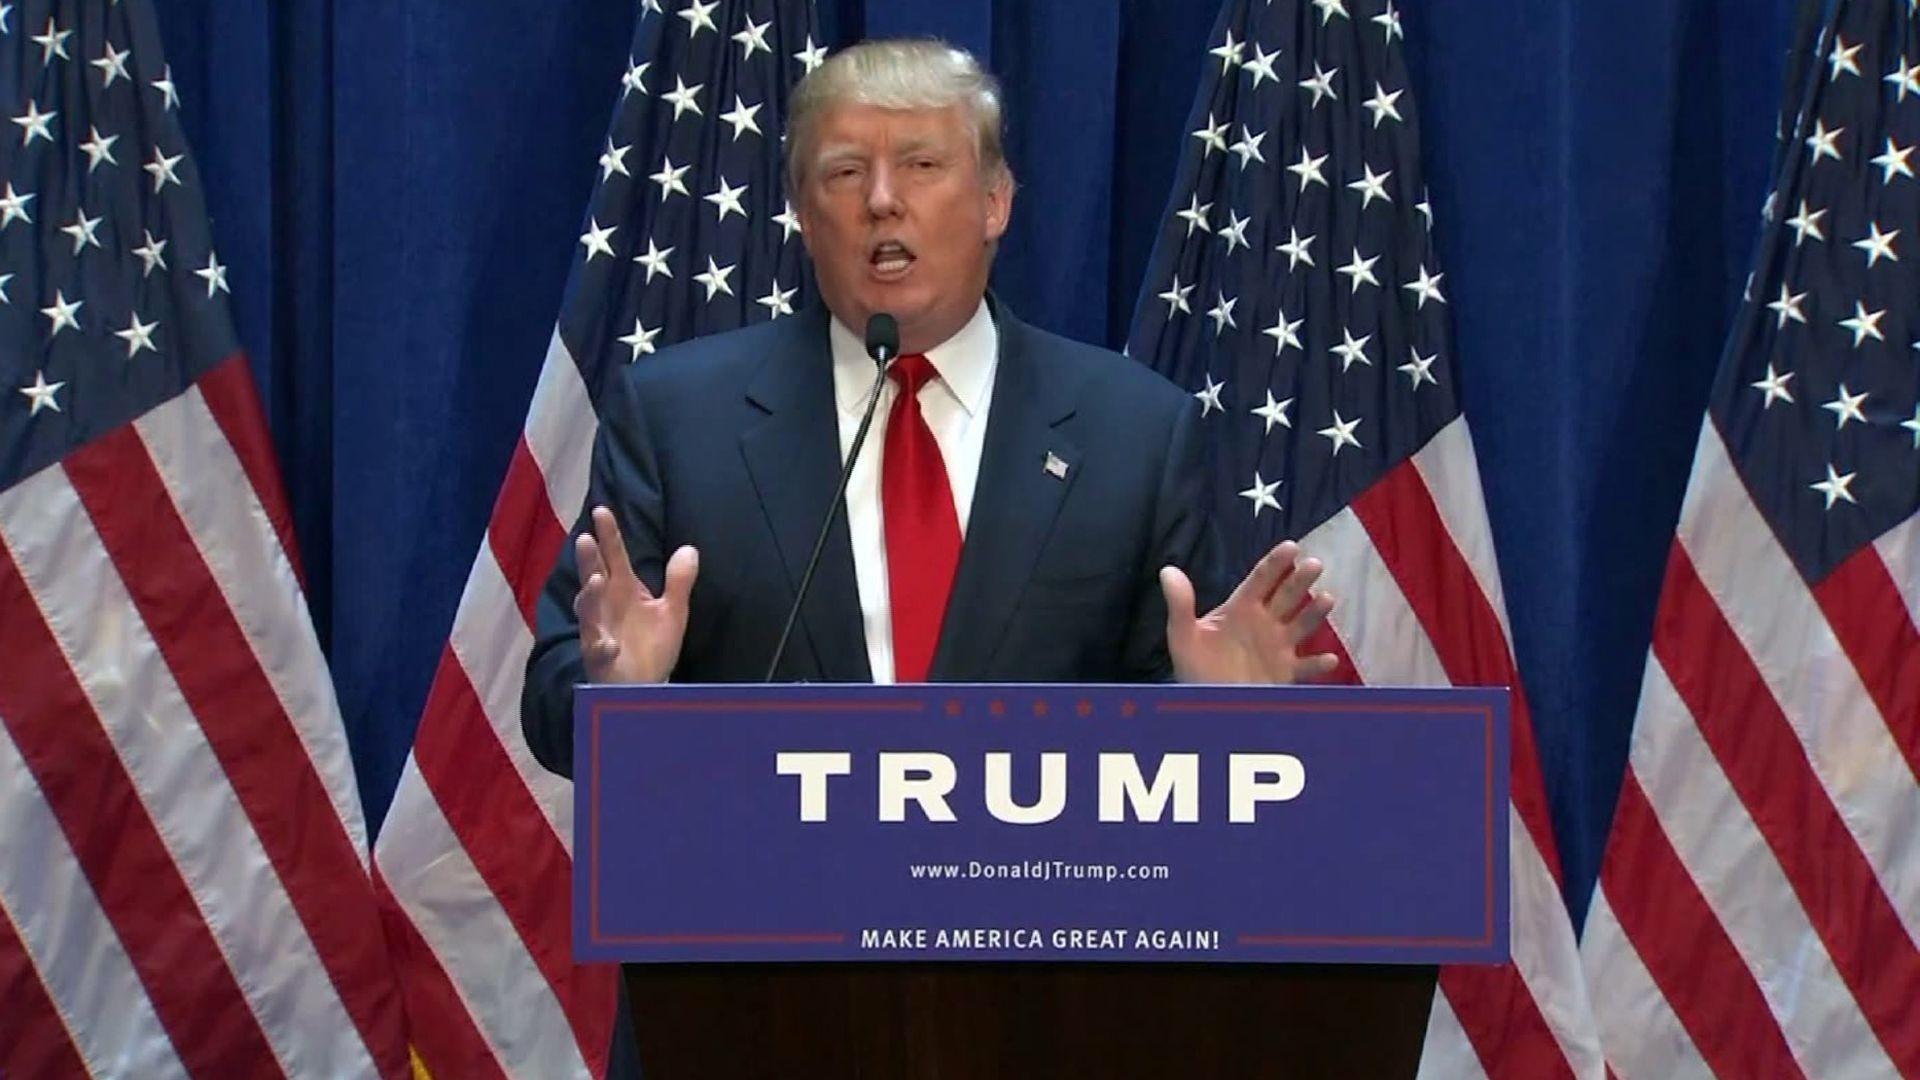 Donald Trump Wallpapers